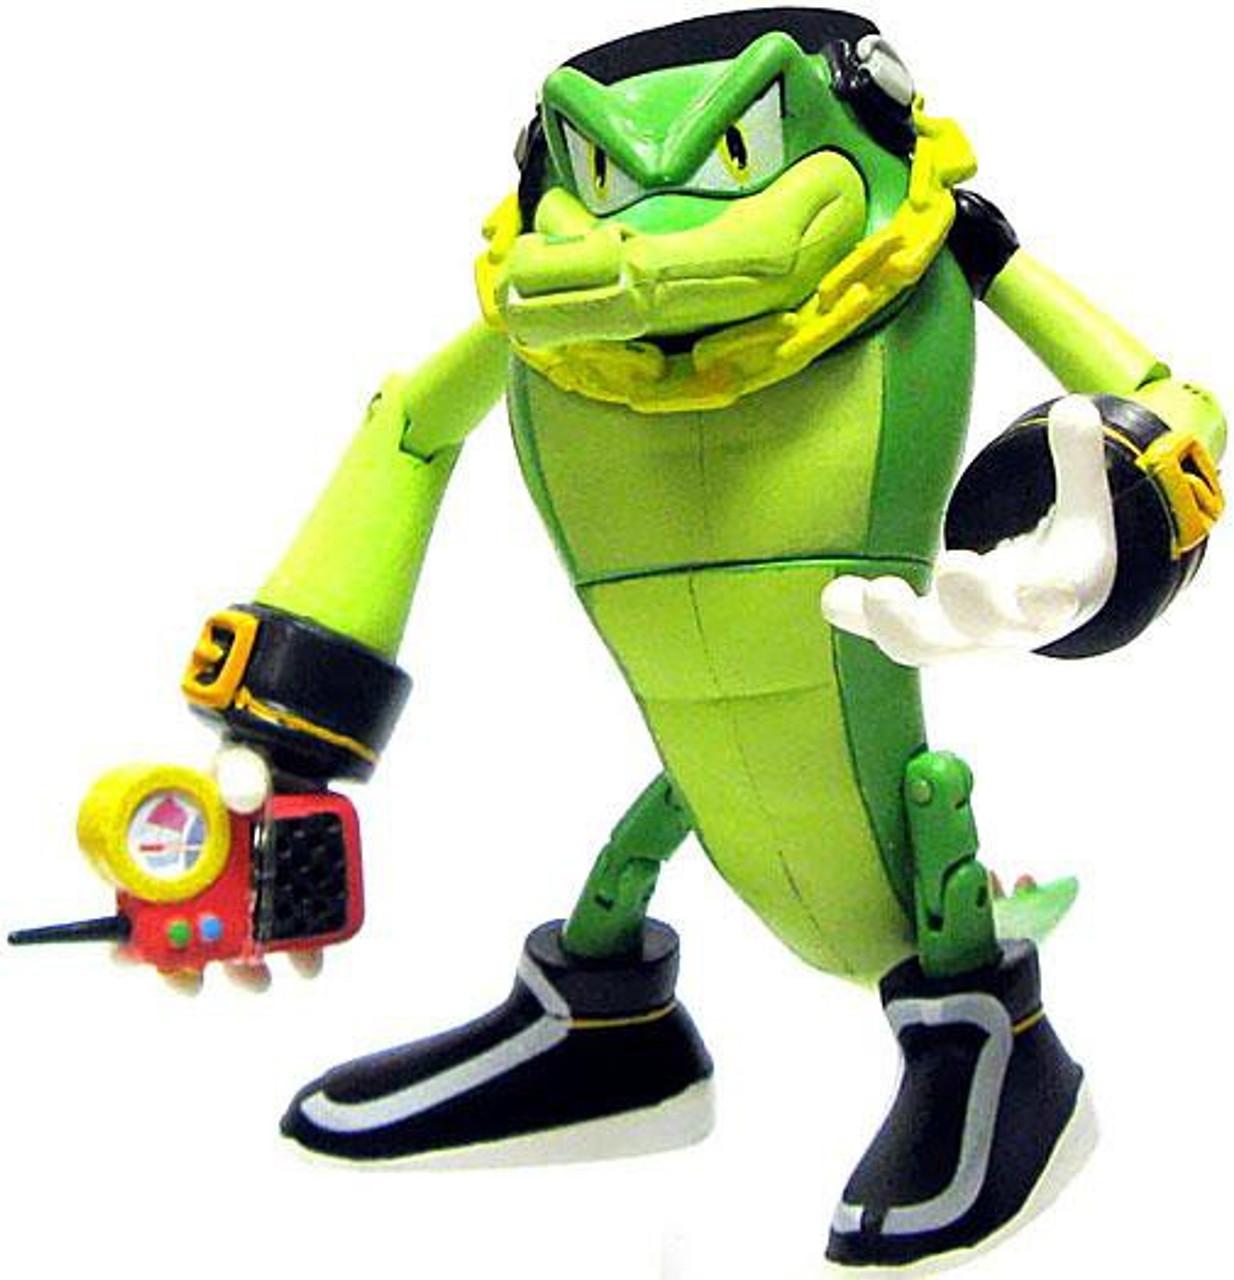 Sonic The Hedgehog Vector The Crocodile 3 5 Action Figure Holding Phone Loose Jazwares Toywiz